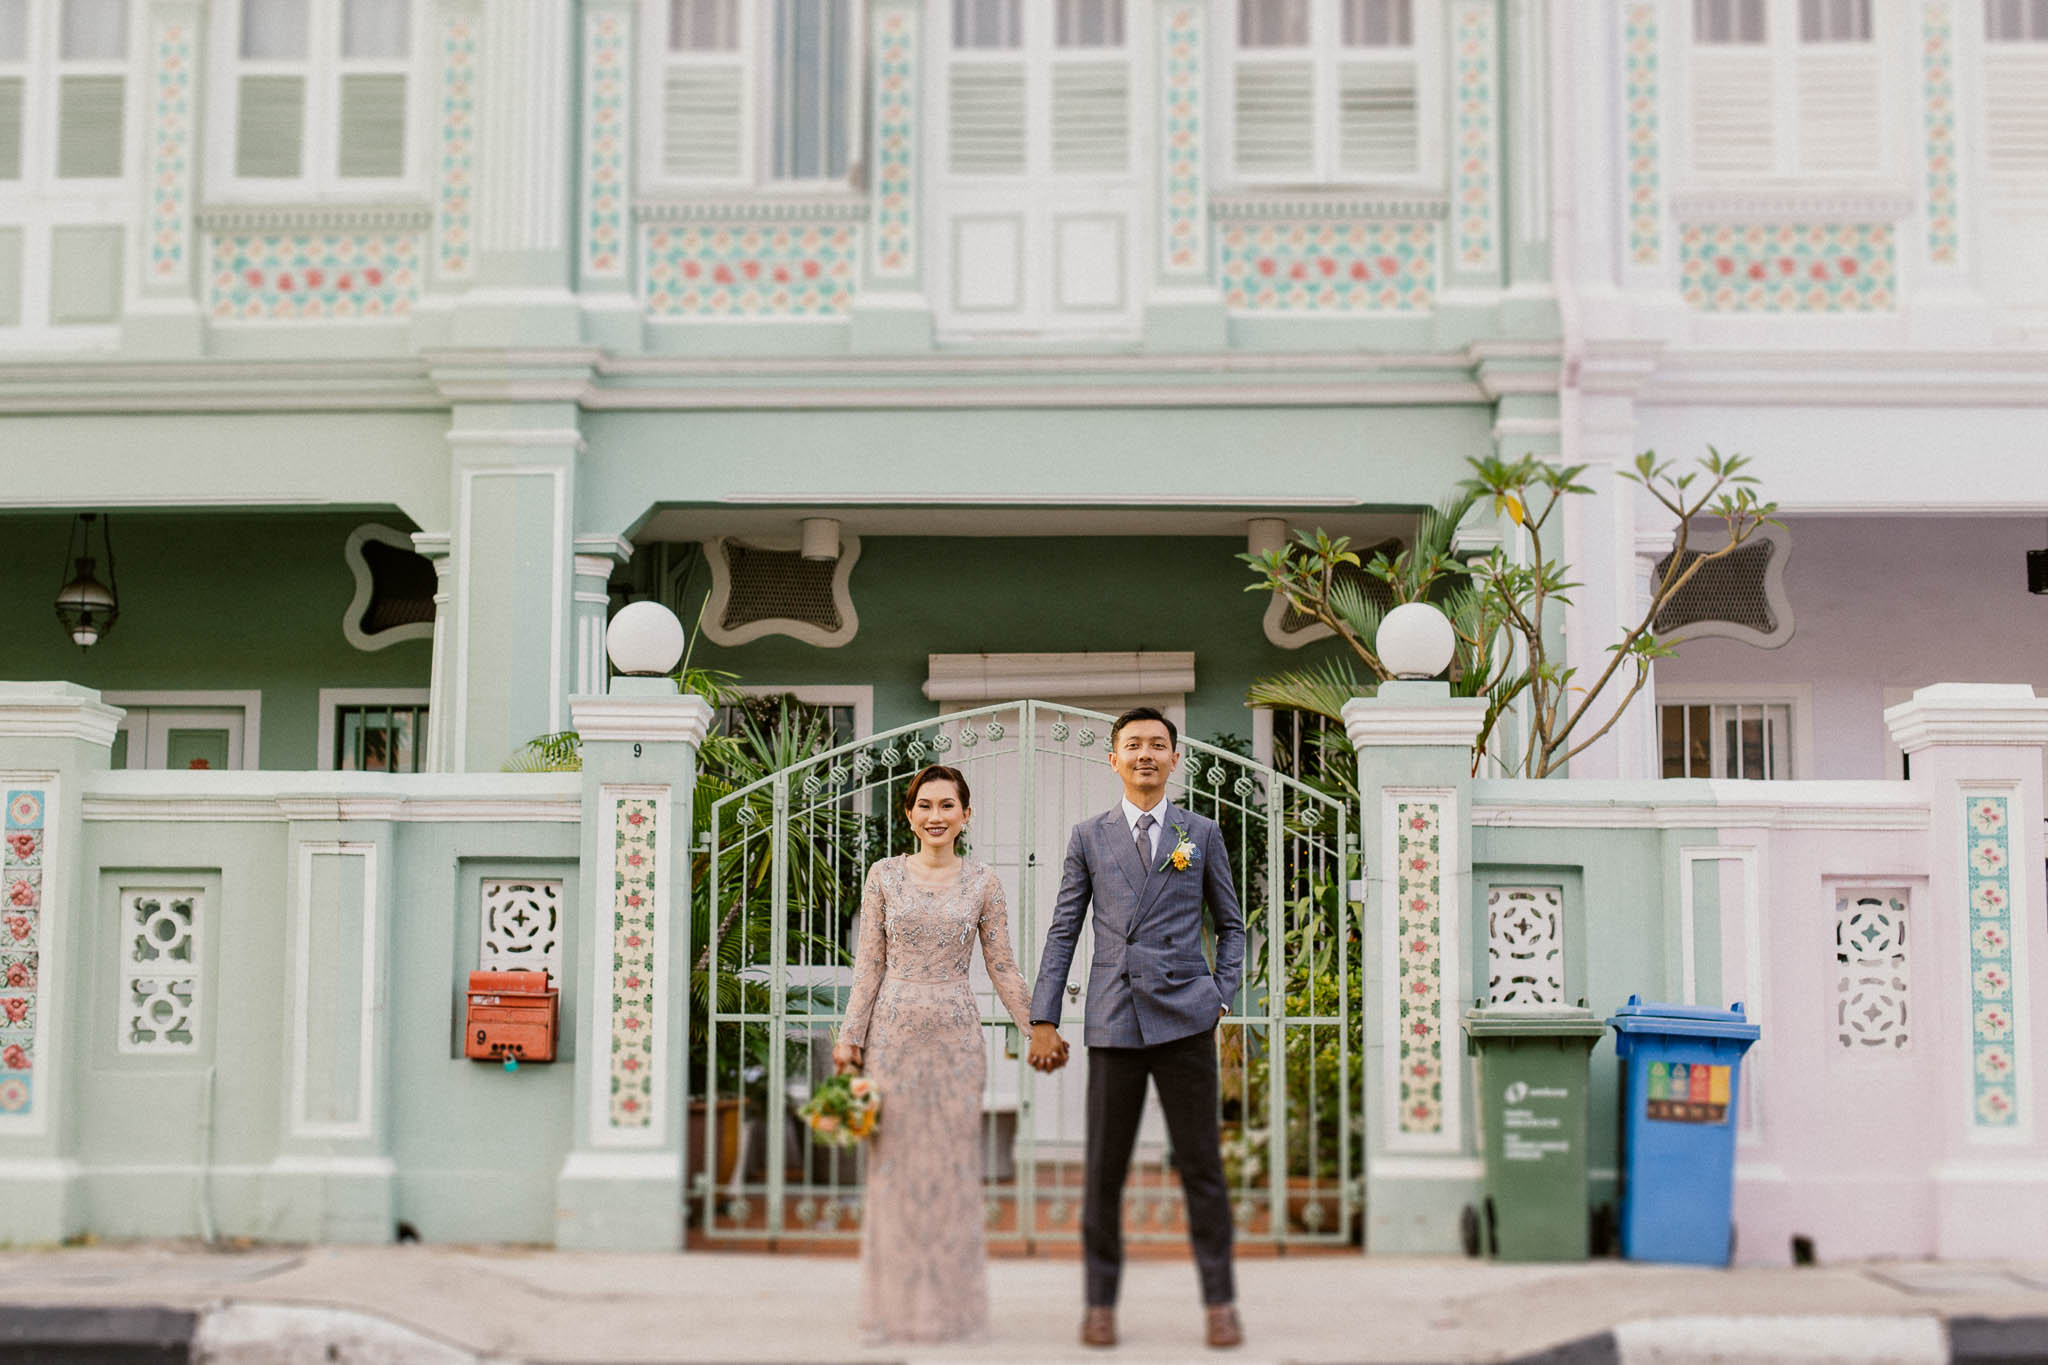 singapore-wedding-photographer-wedding-nufail-addafiq-077.jpg